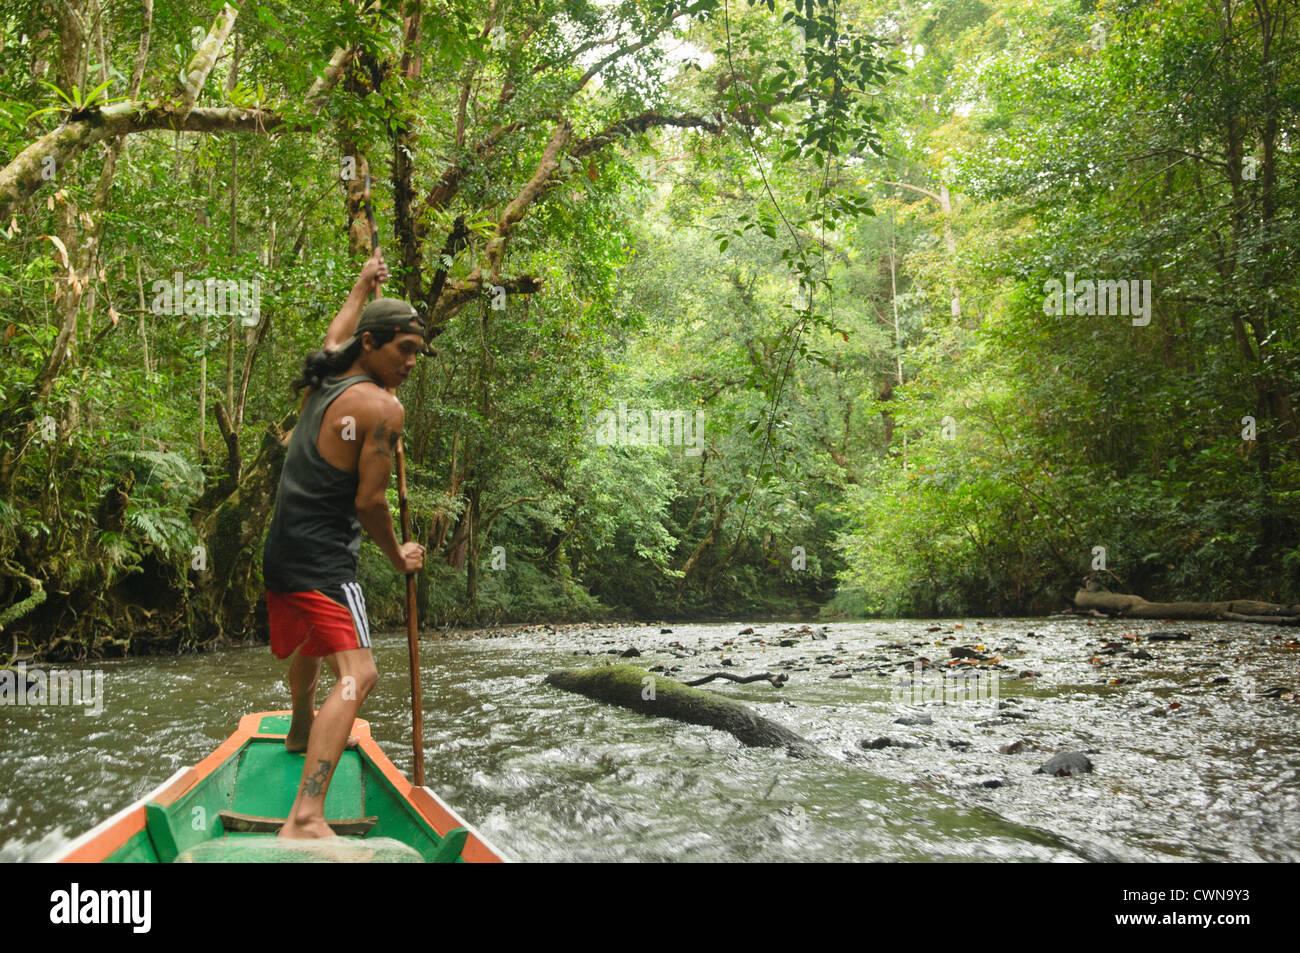 Iban man navigating the river in Batang Ai National Park in Sarawak, Borneo, Malaysia - Stock Image